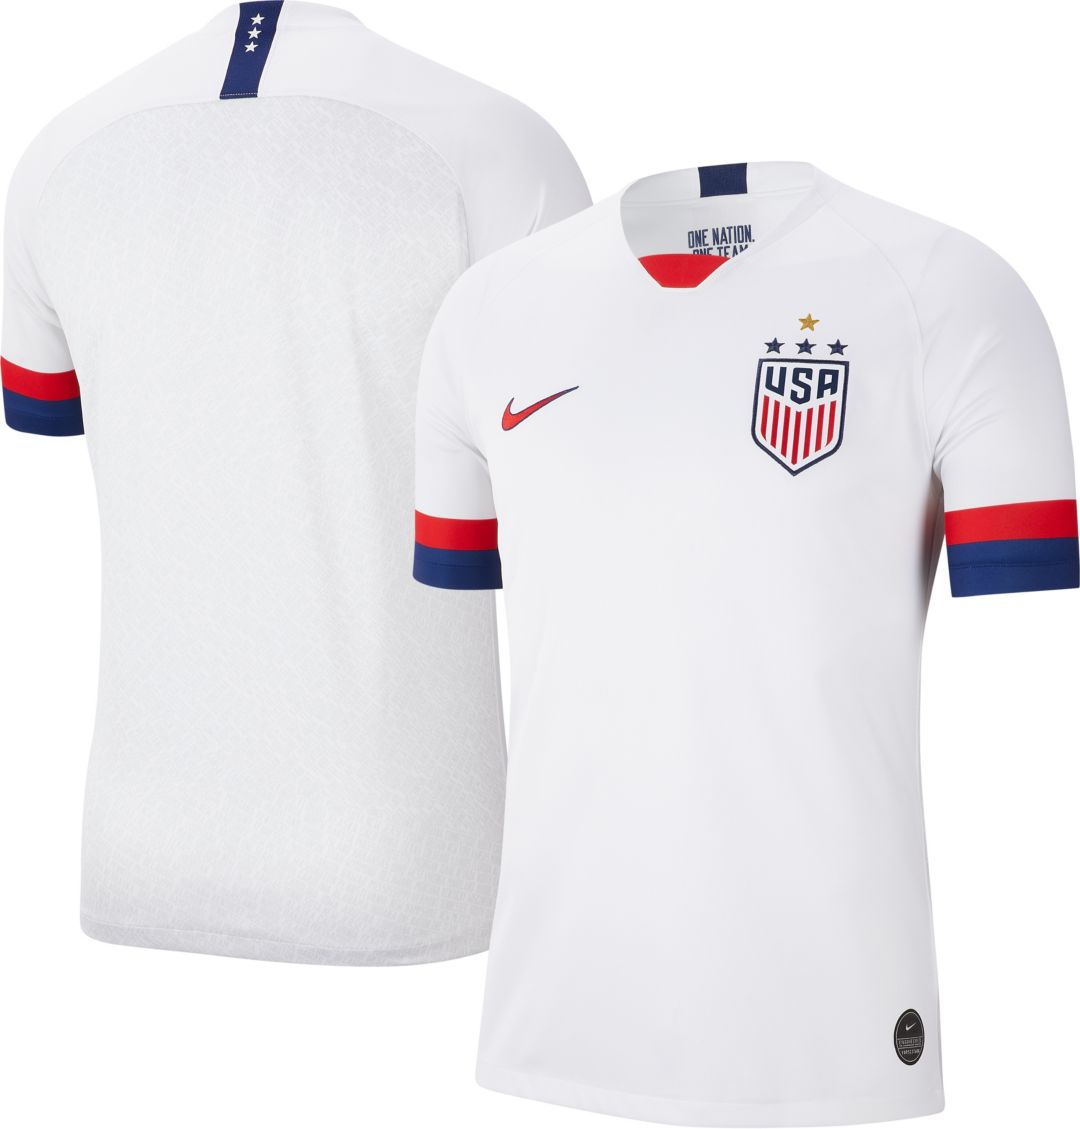 32c951dcf Nike Men's 2019 FIFA Women's World Cup USA Soccer 4-Star Breathe ...